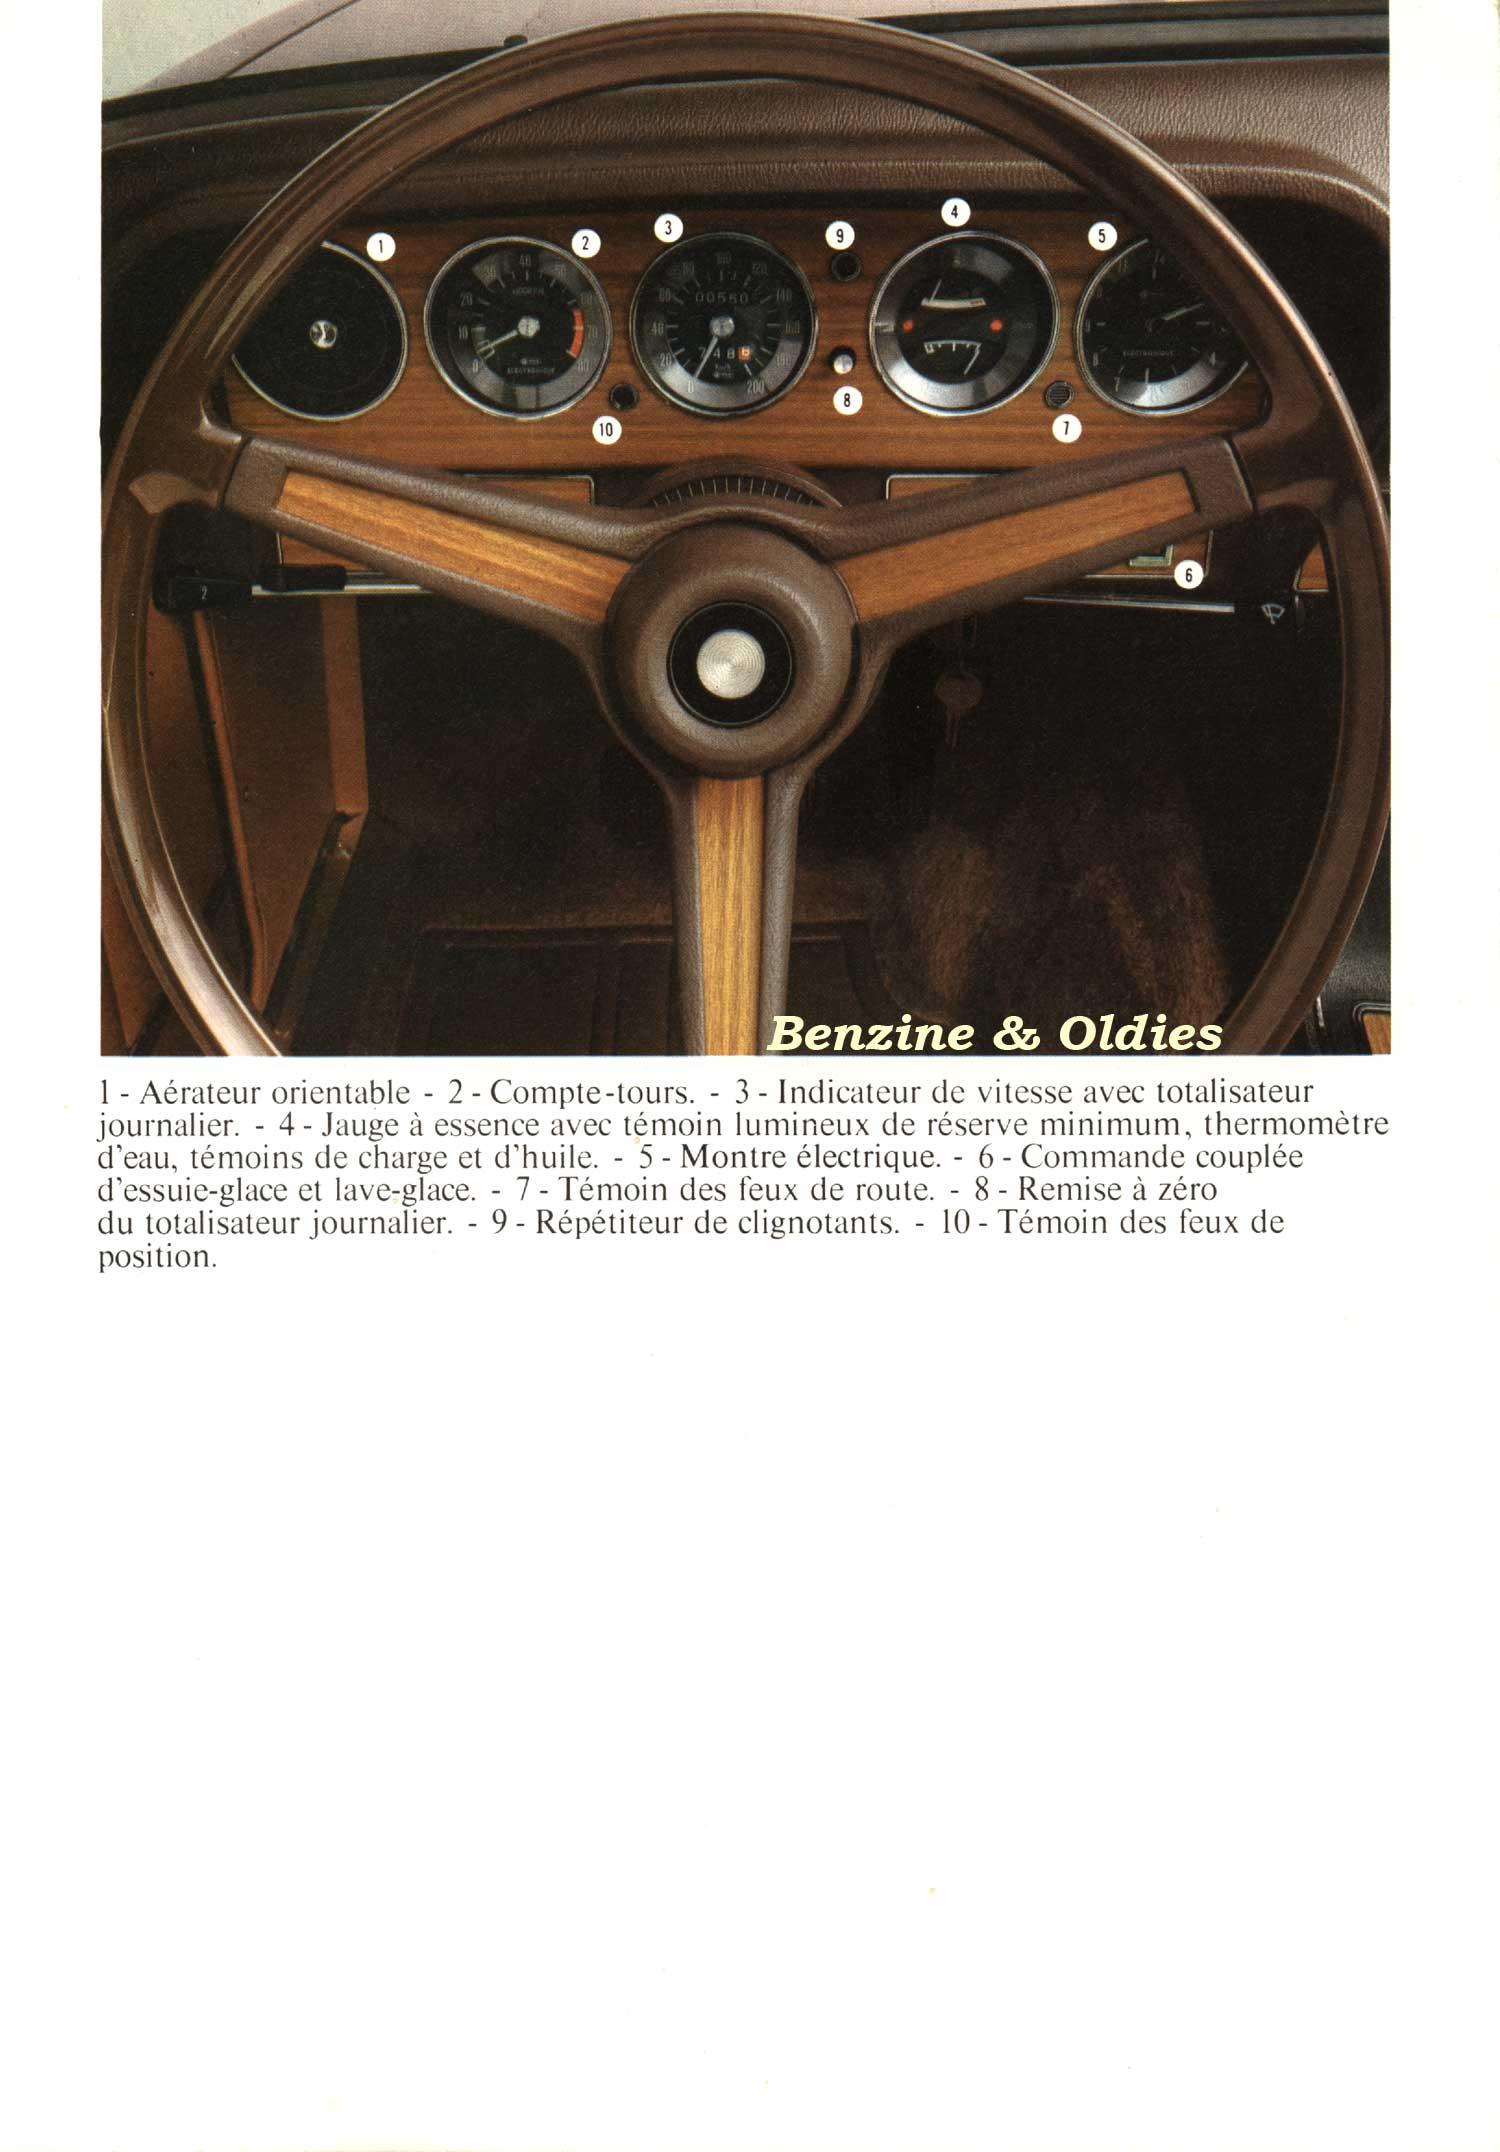 Chrysler 180 : catalogue 01 Chrysler_180_catalogue_01_p5_w1500